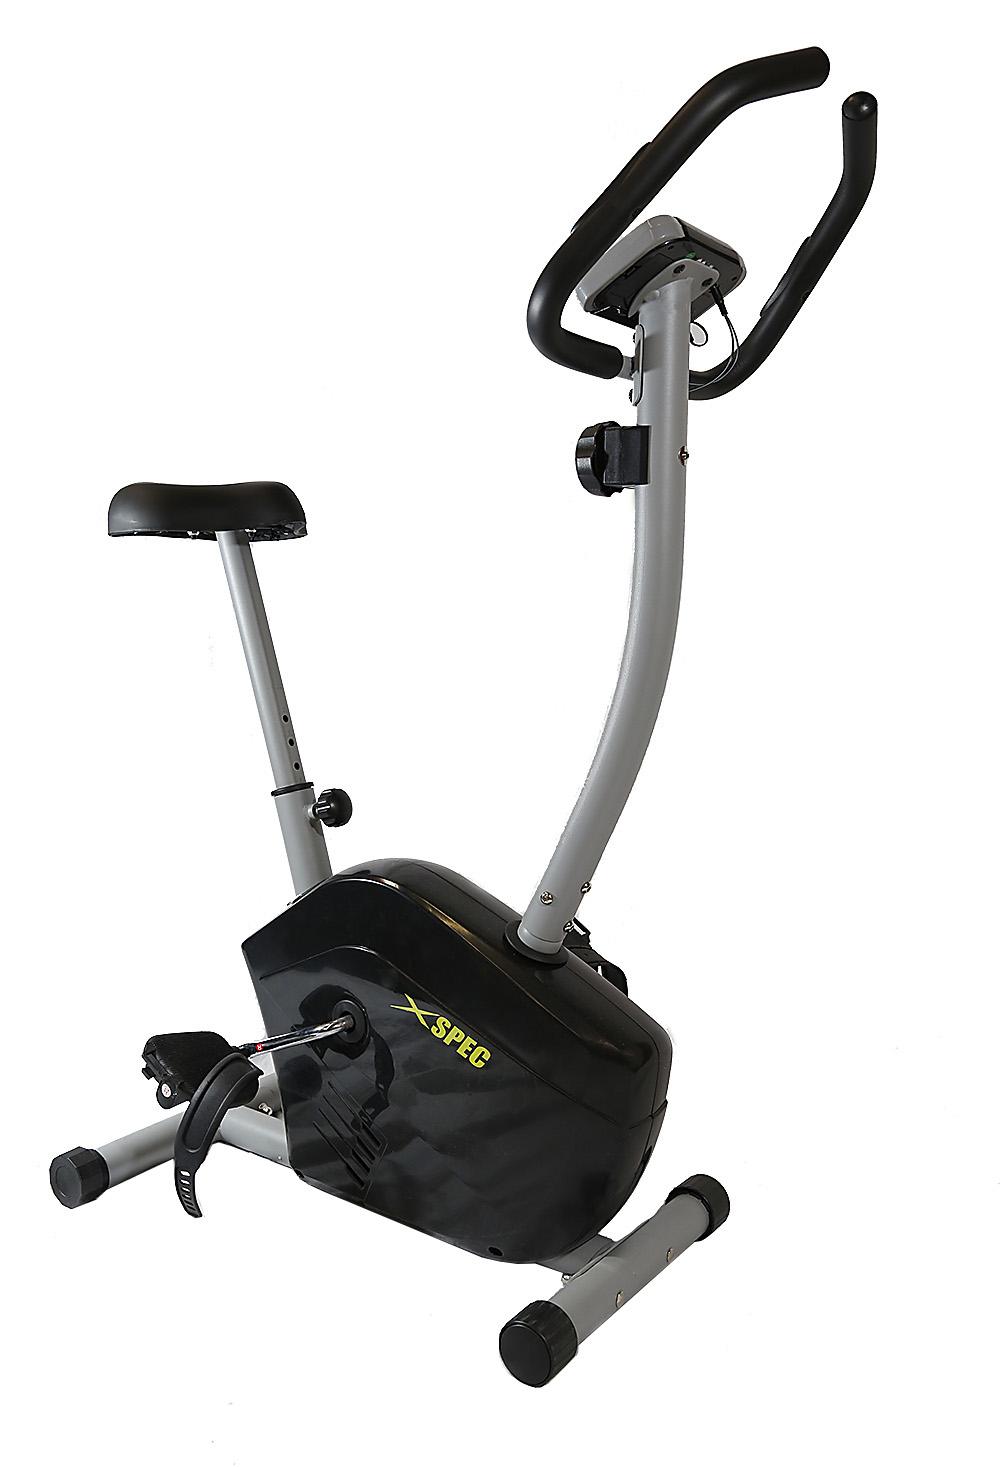 Permalink to New Balance Exercise Bike